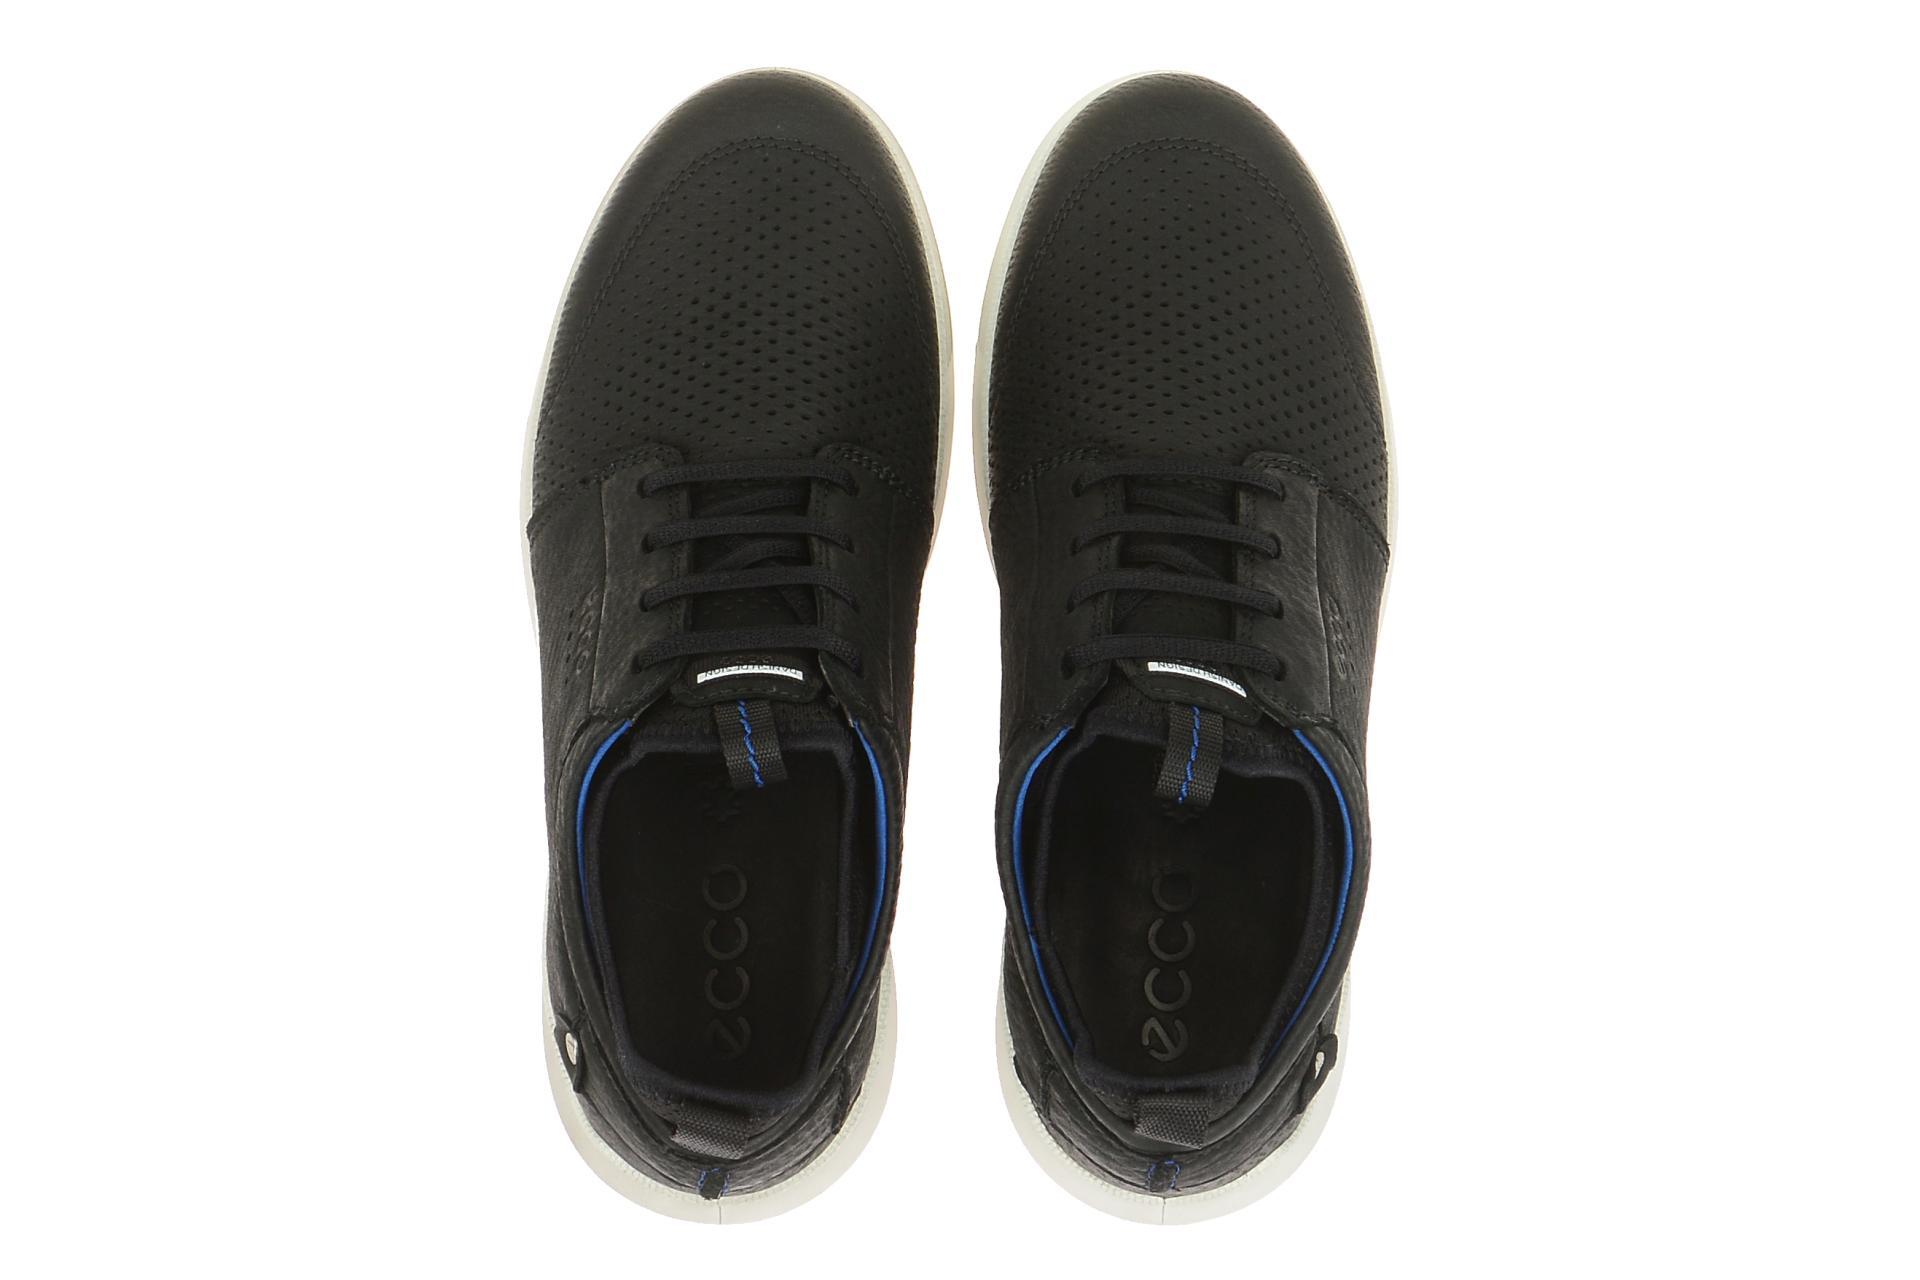 Neue Ankunft Schuhe Sandalen LASOCKI 2609 14 Schwarz